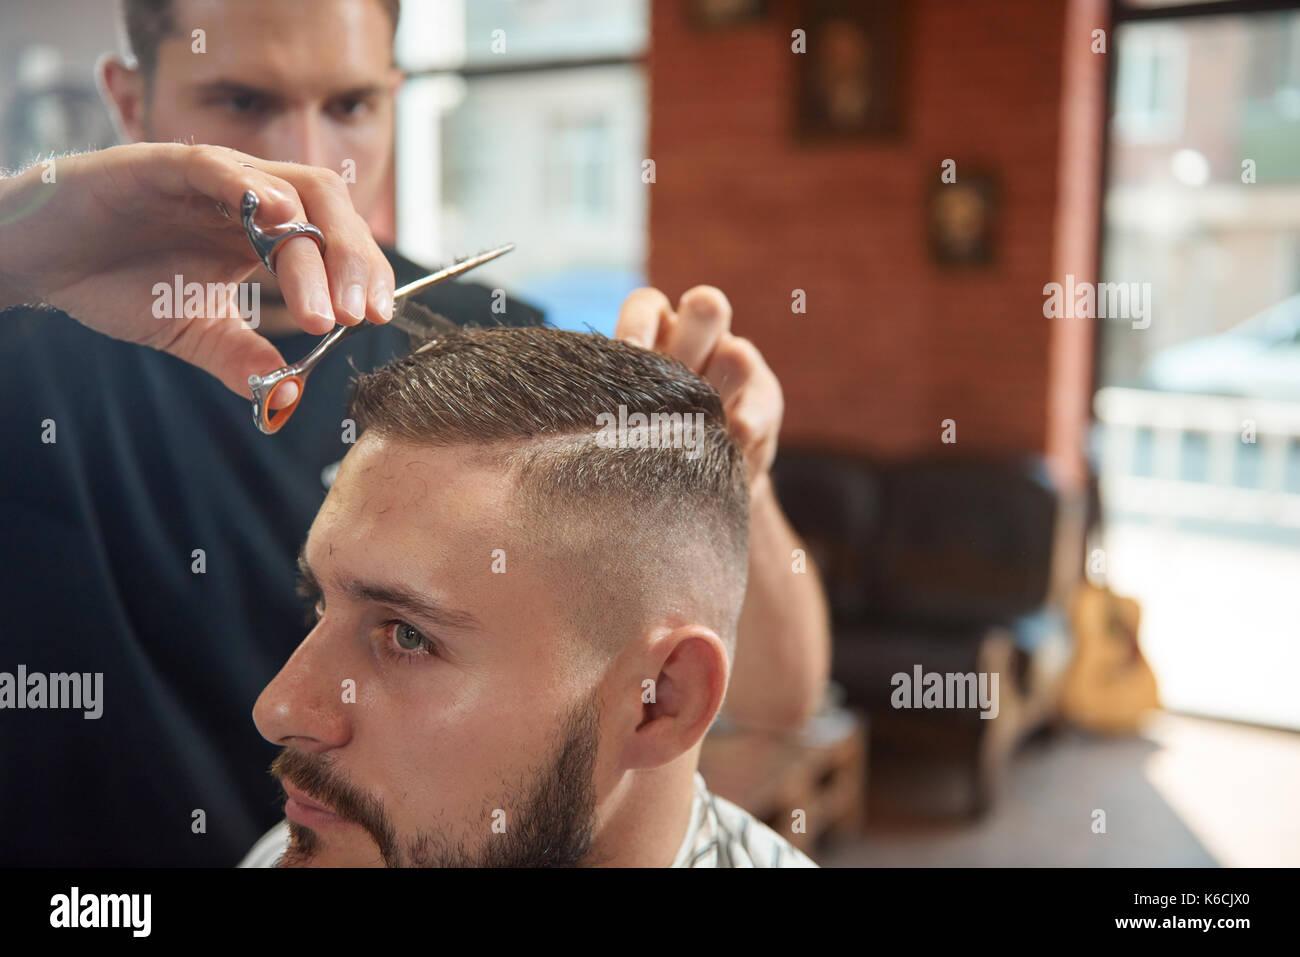 Young man at the barbershop - Stock Image